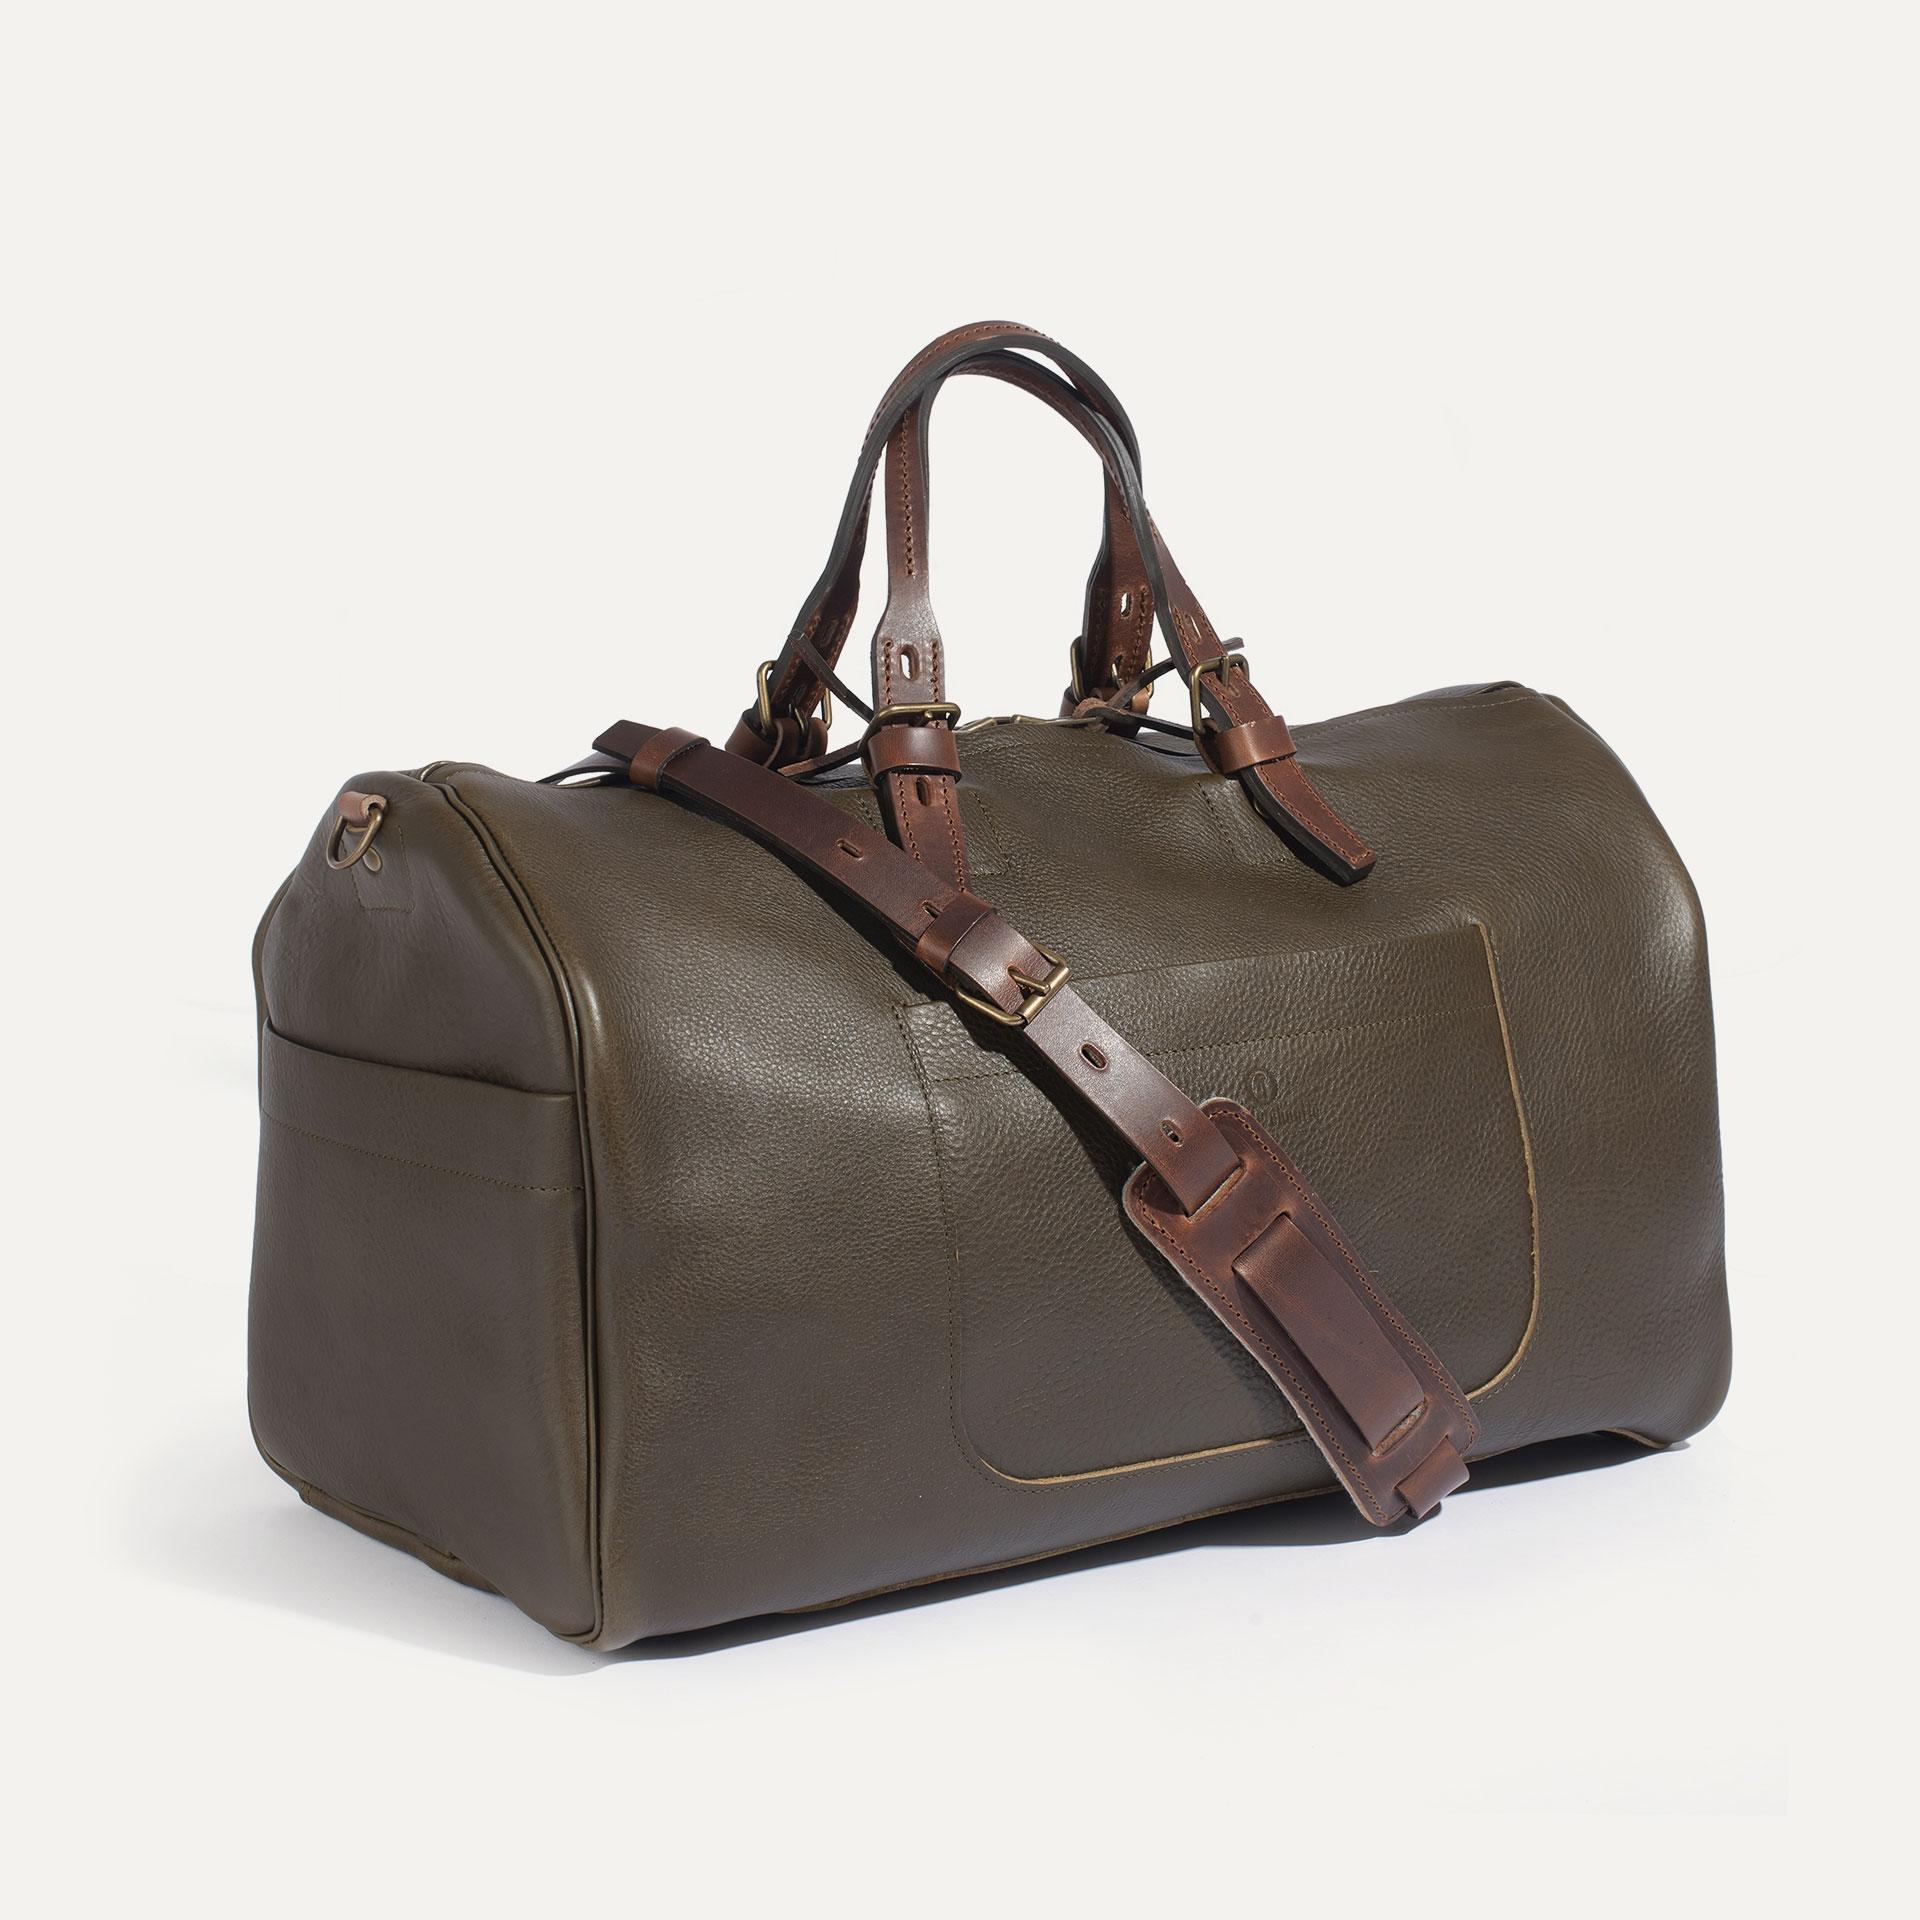 Hobo Travel bag - Khaki (image n°2)